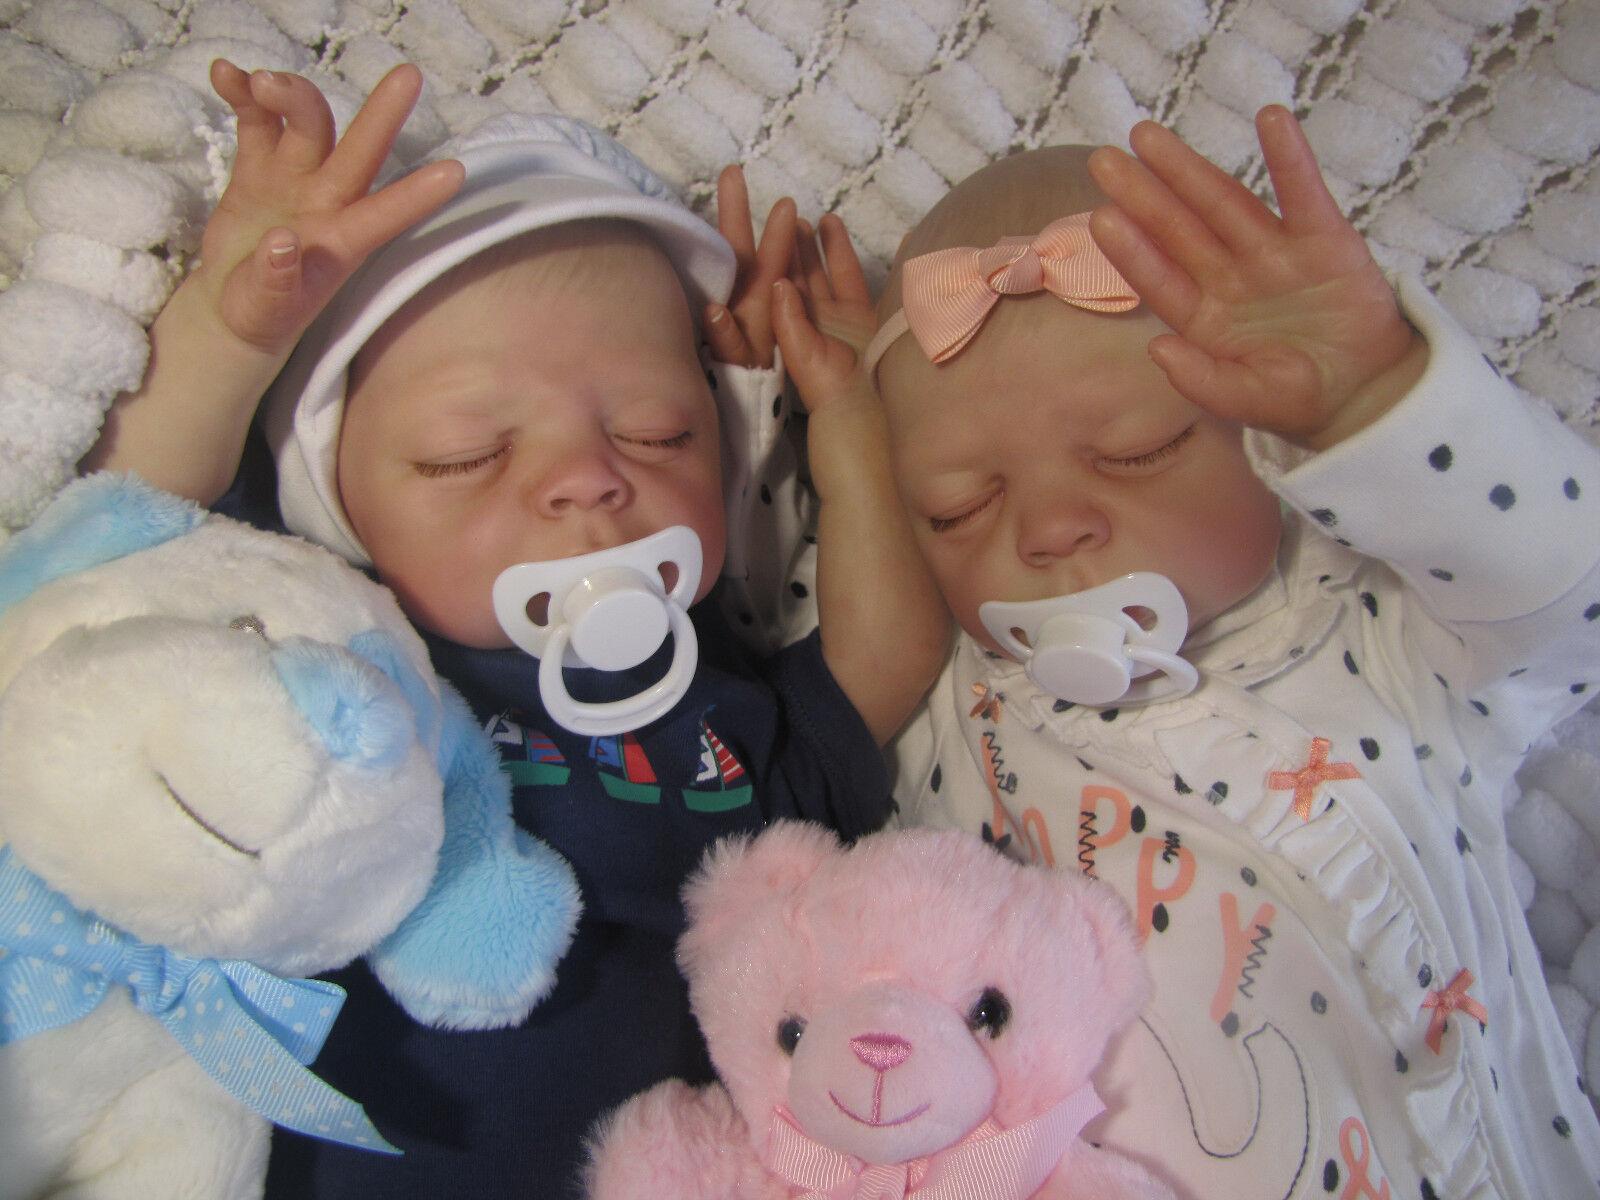 Bambola realistica neonato Eva Helland Reborn sunbeambabies dipinti a mano morbido vinile